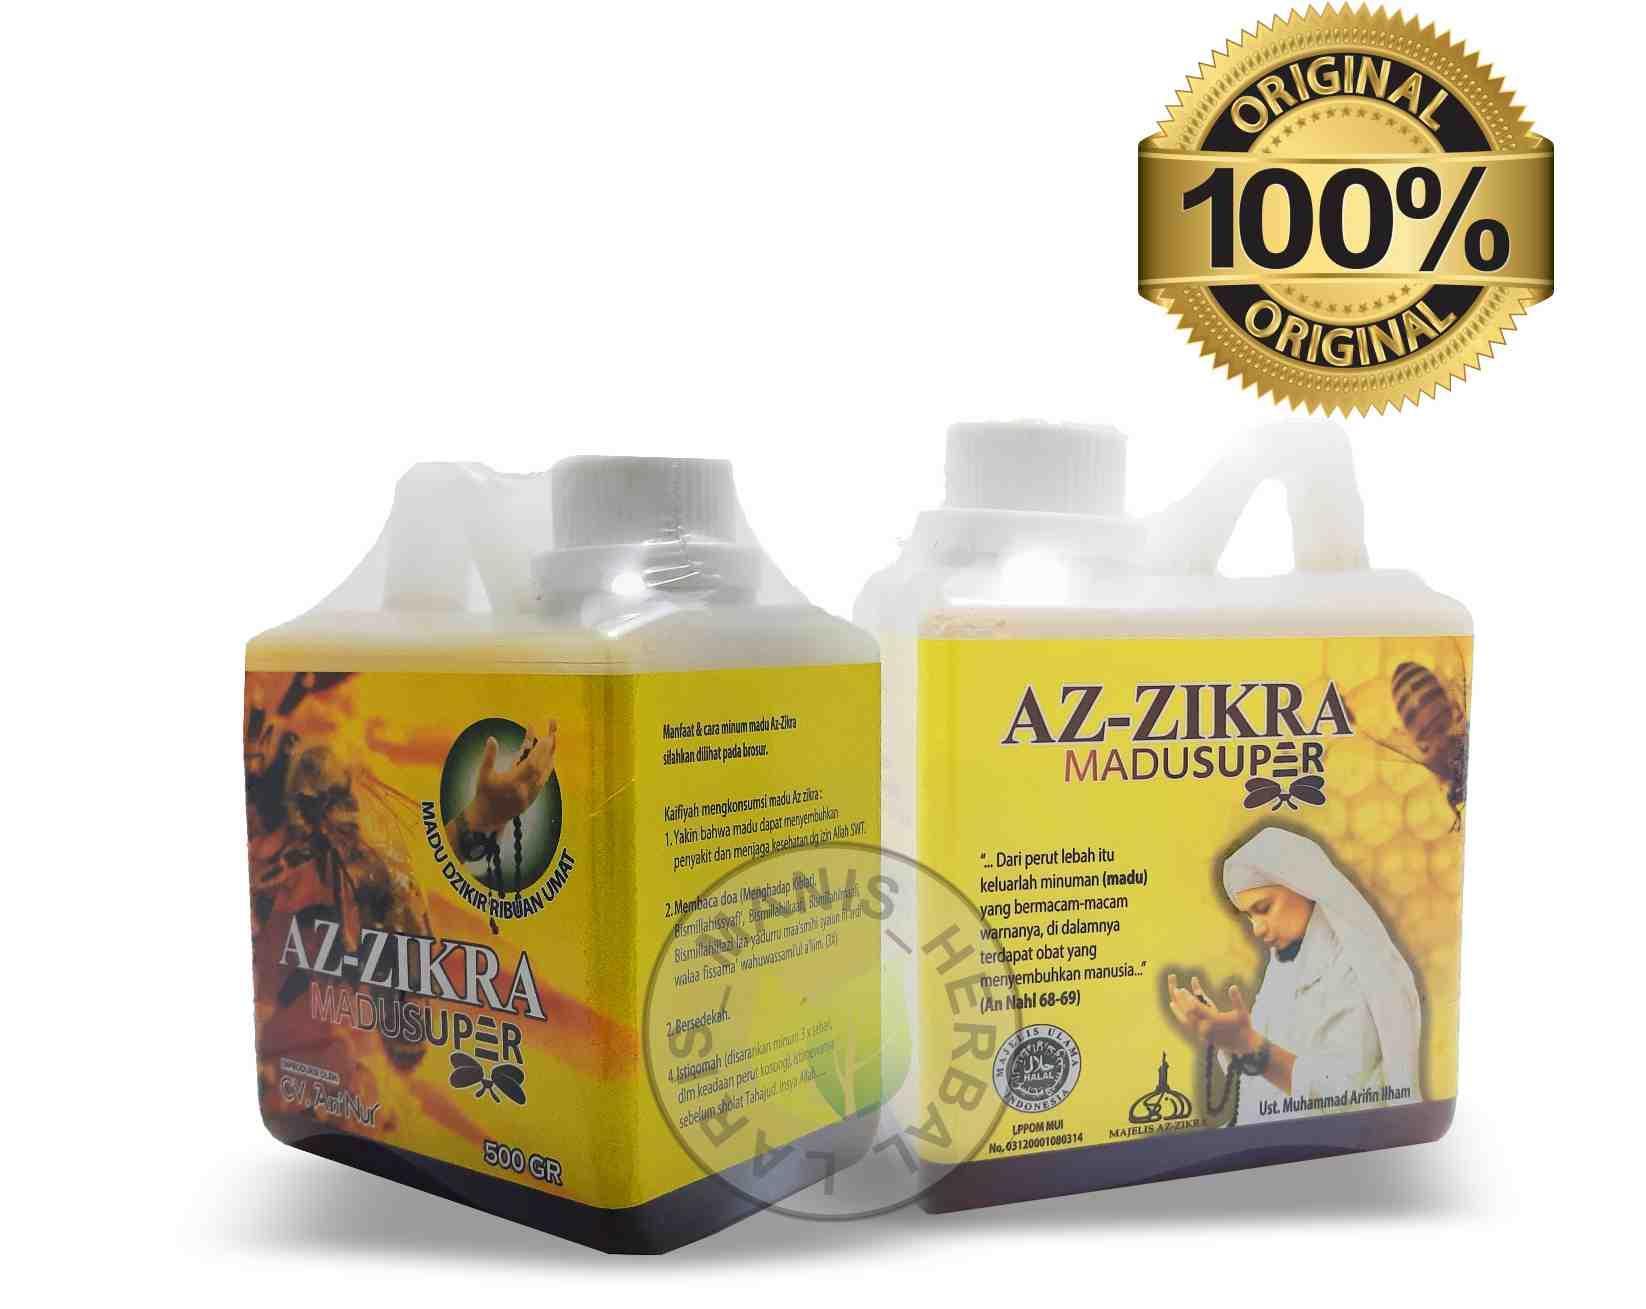 Buy Sell Cheapest Madu Super Azzikra Best Quality Product Deals Az Zikra 500 Gram Aseli Original Ustadz Arifin Ilham